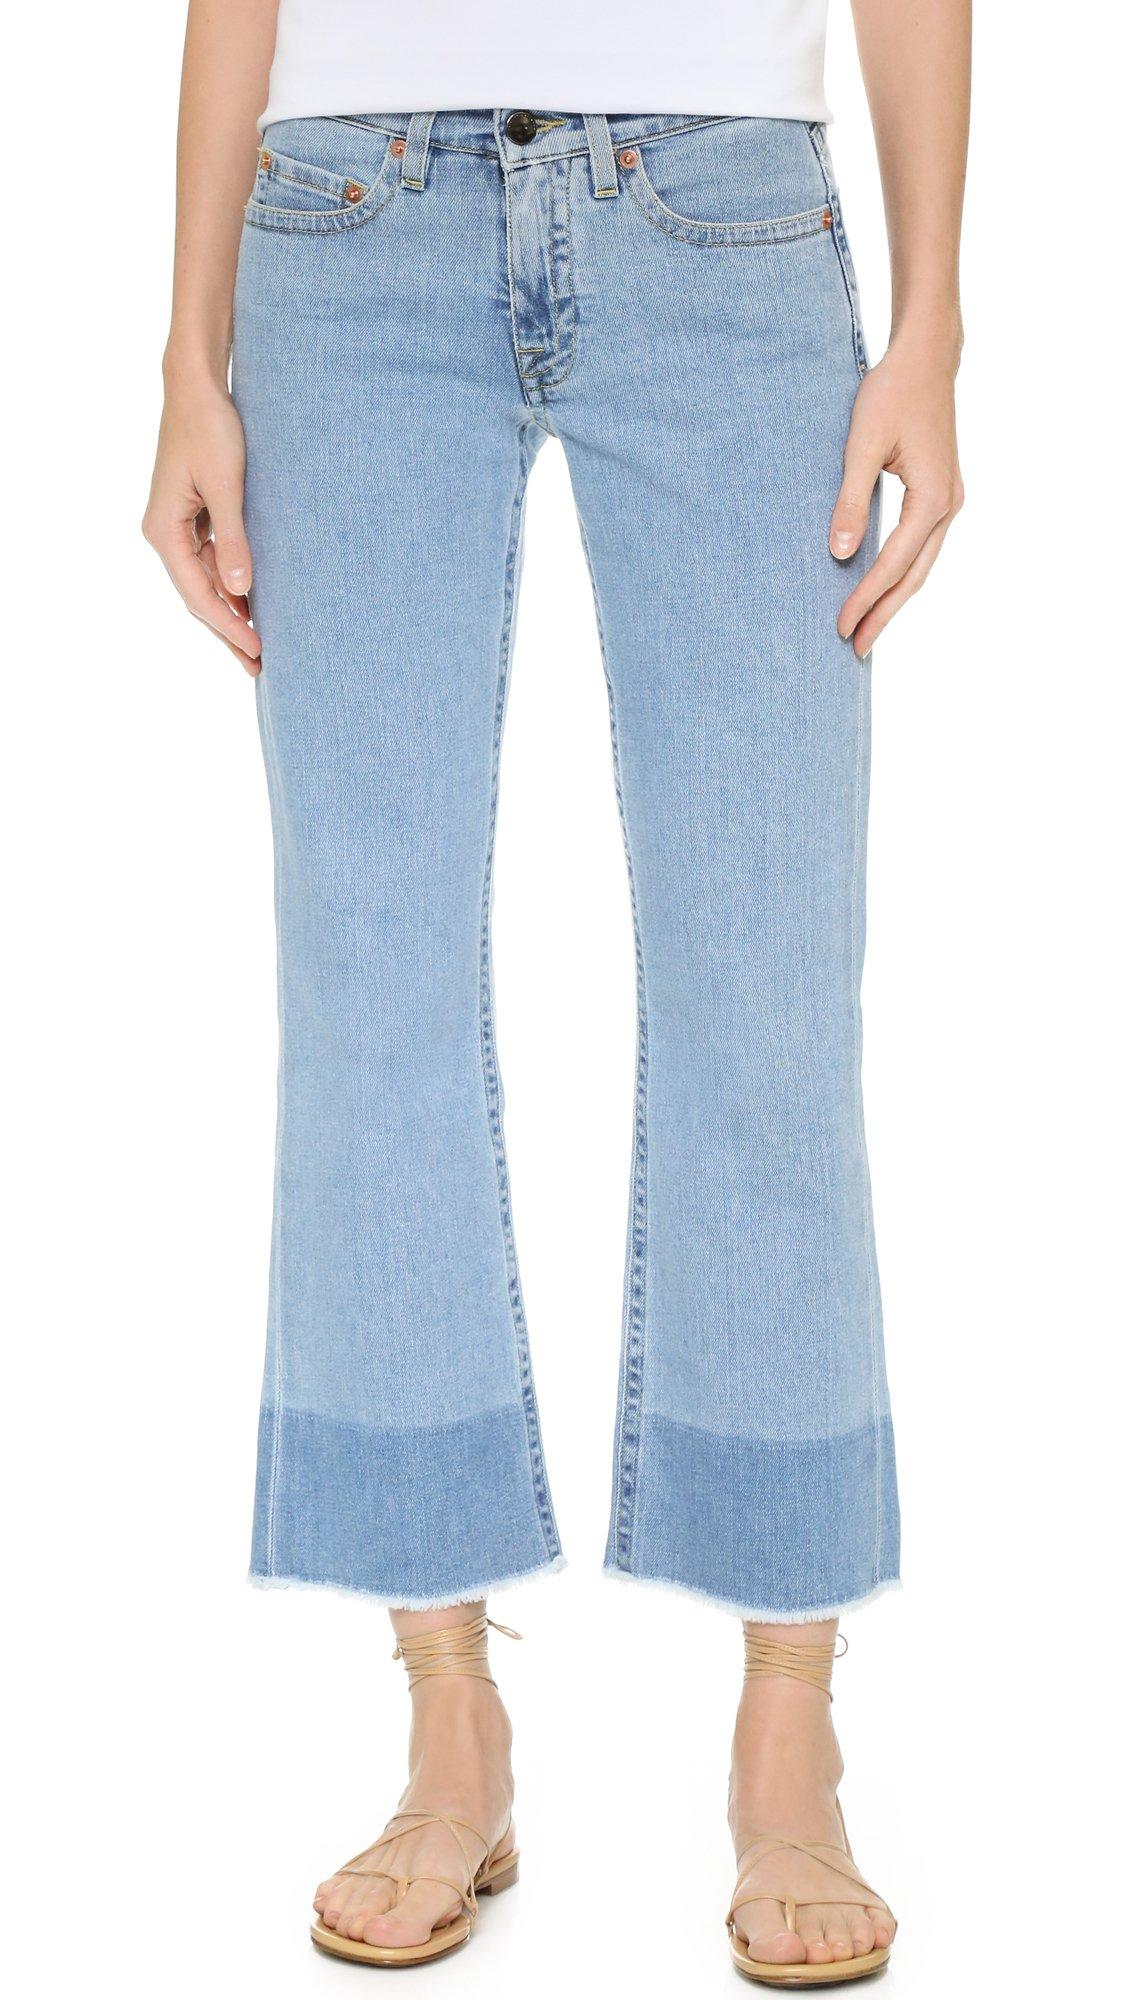 victoria victoria beckham kick flare jeans in blue lyst. Black Bedroom Furniture Sets. Home Design Ideas